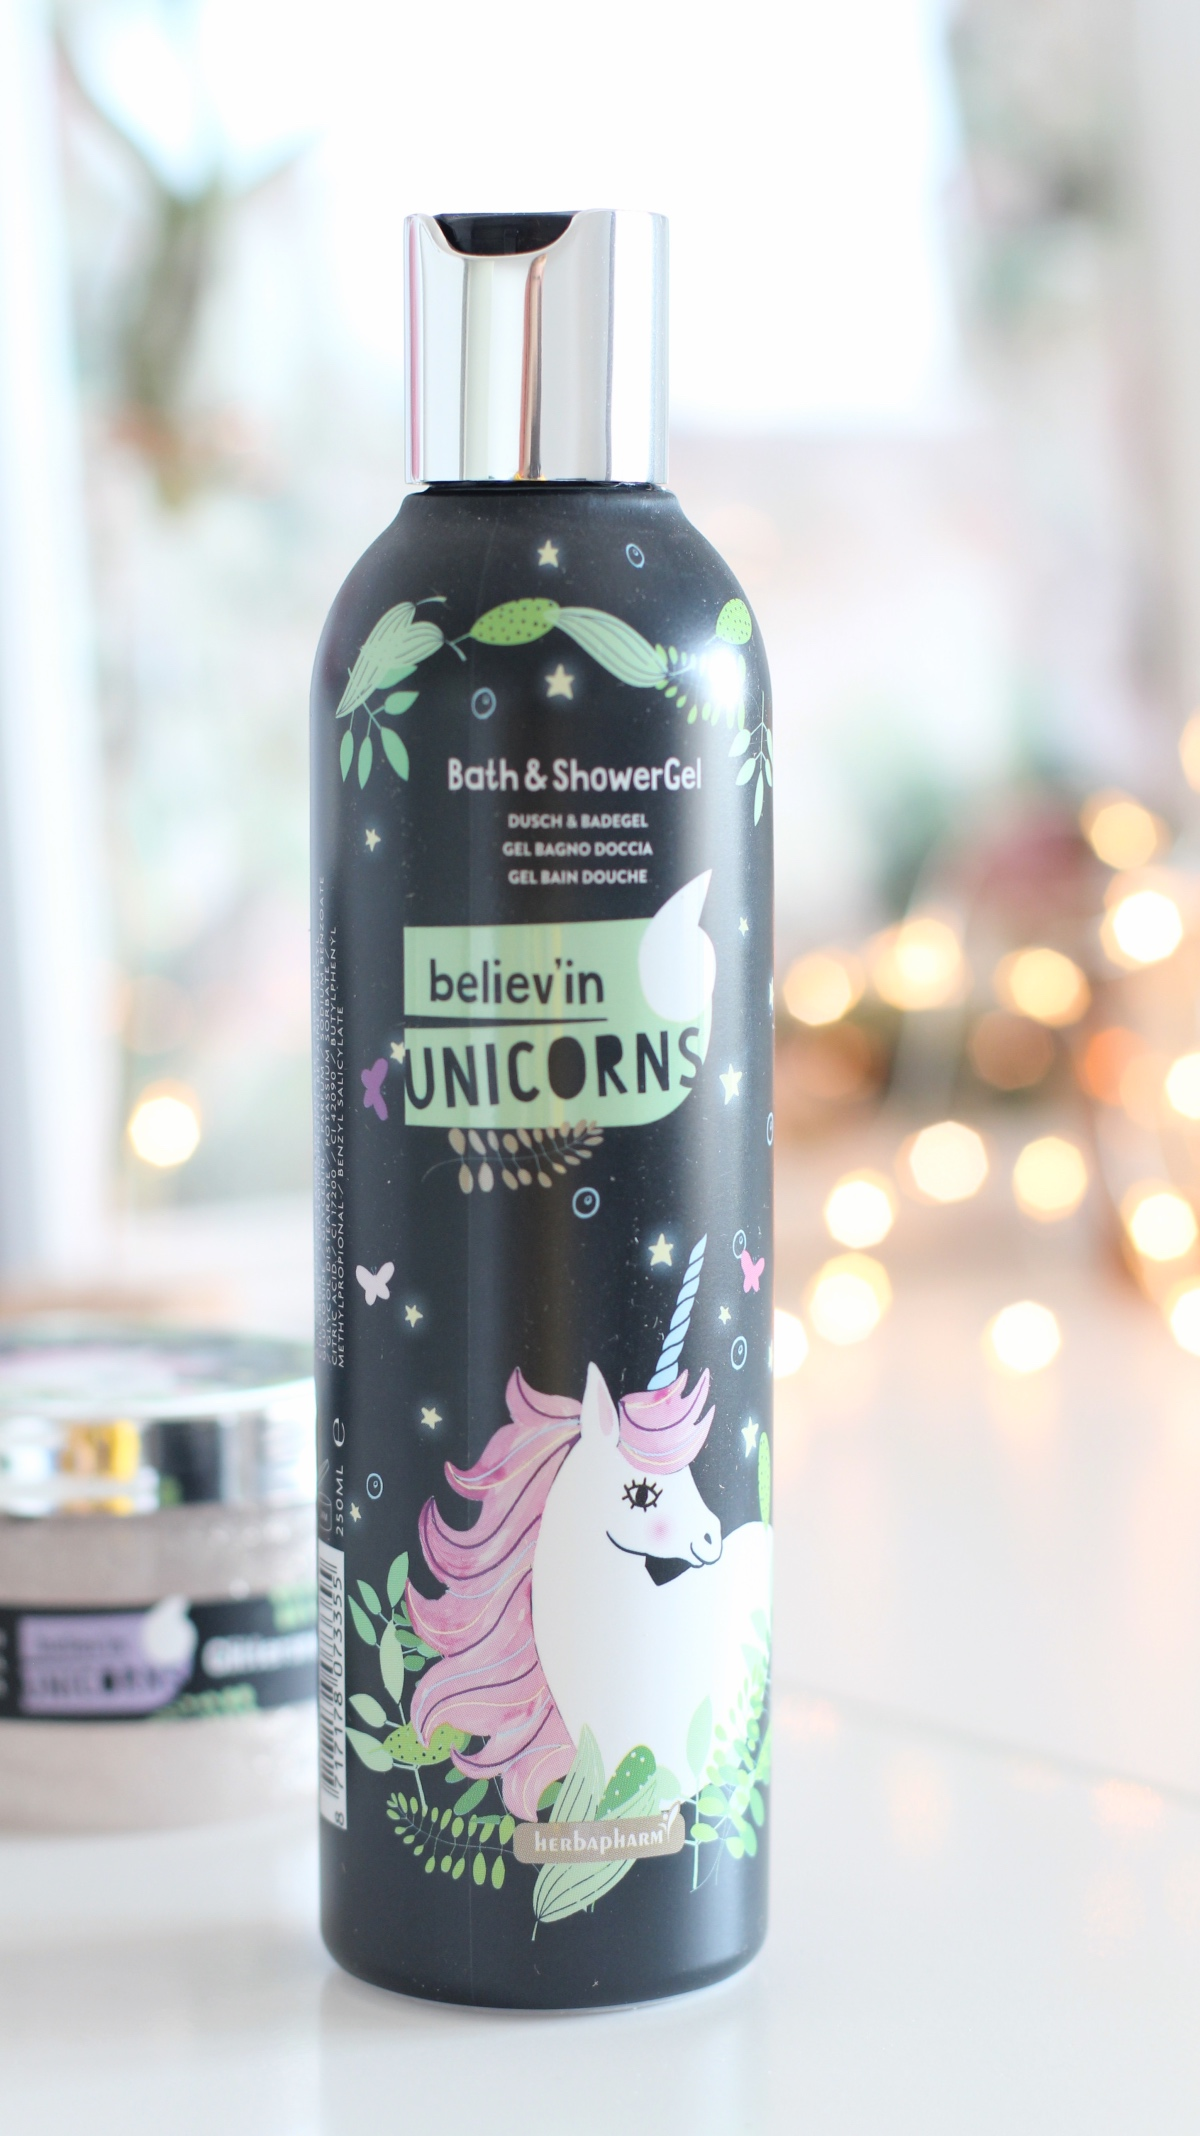 Believ'in Unicorns bath & showergel